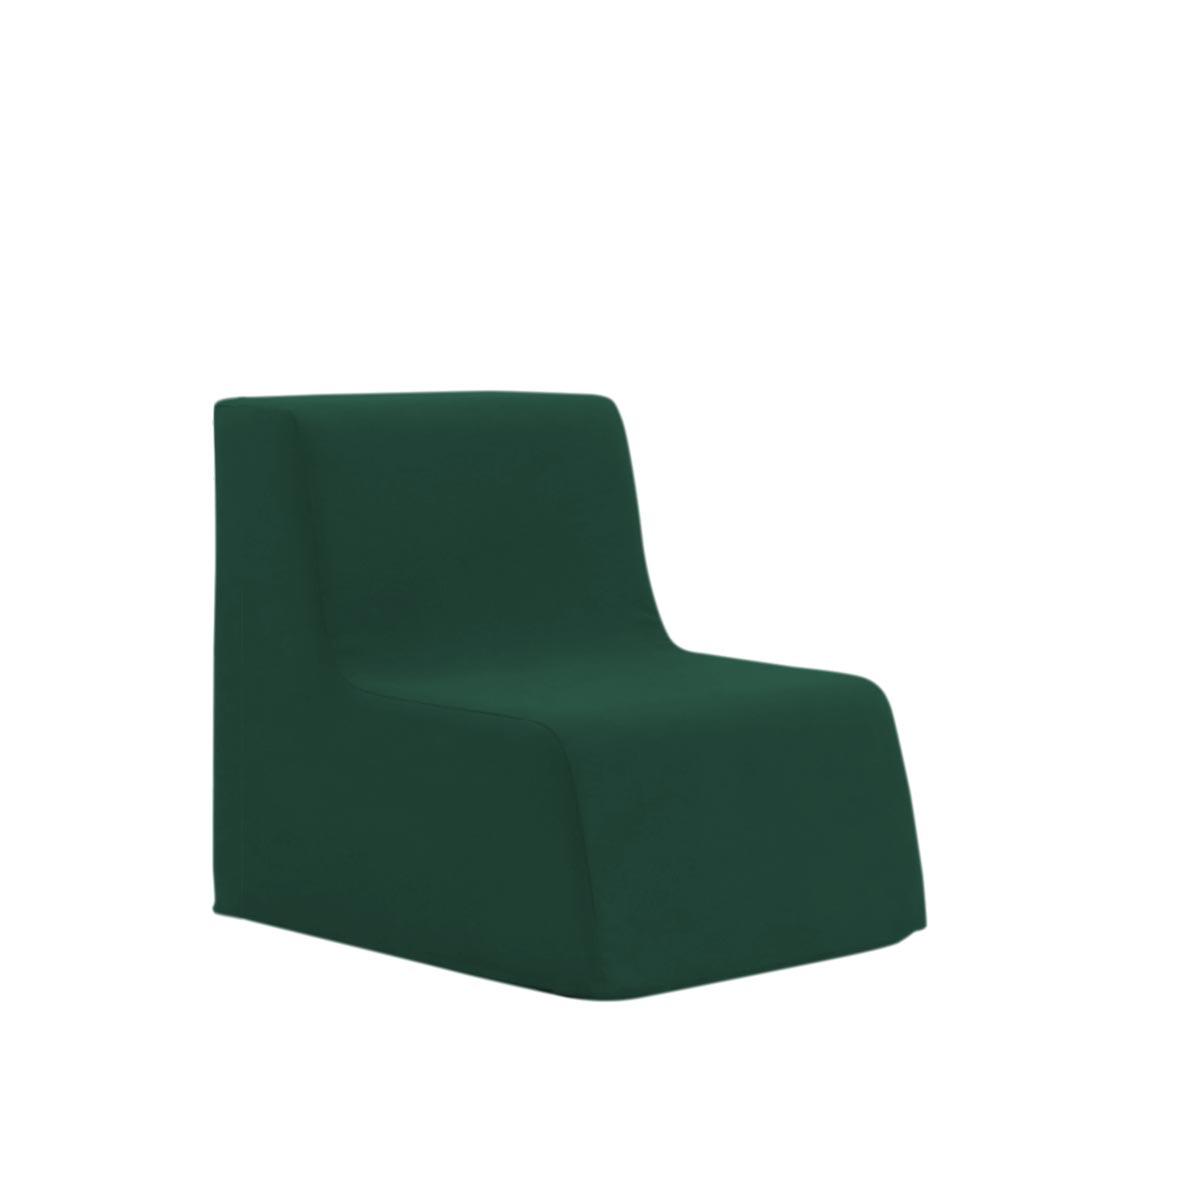 Poltroninha Muss r02 Tecido Lonita Verde Bistro 02